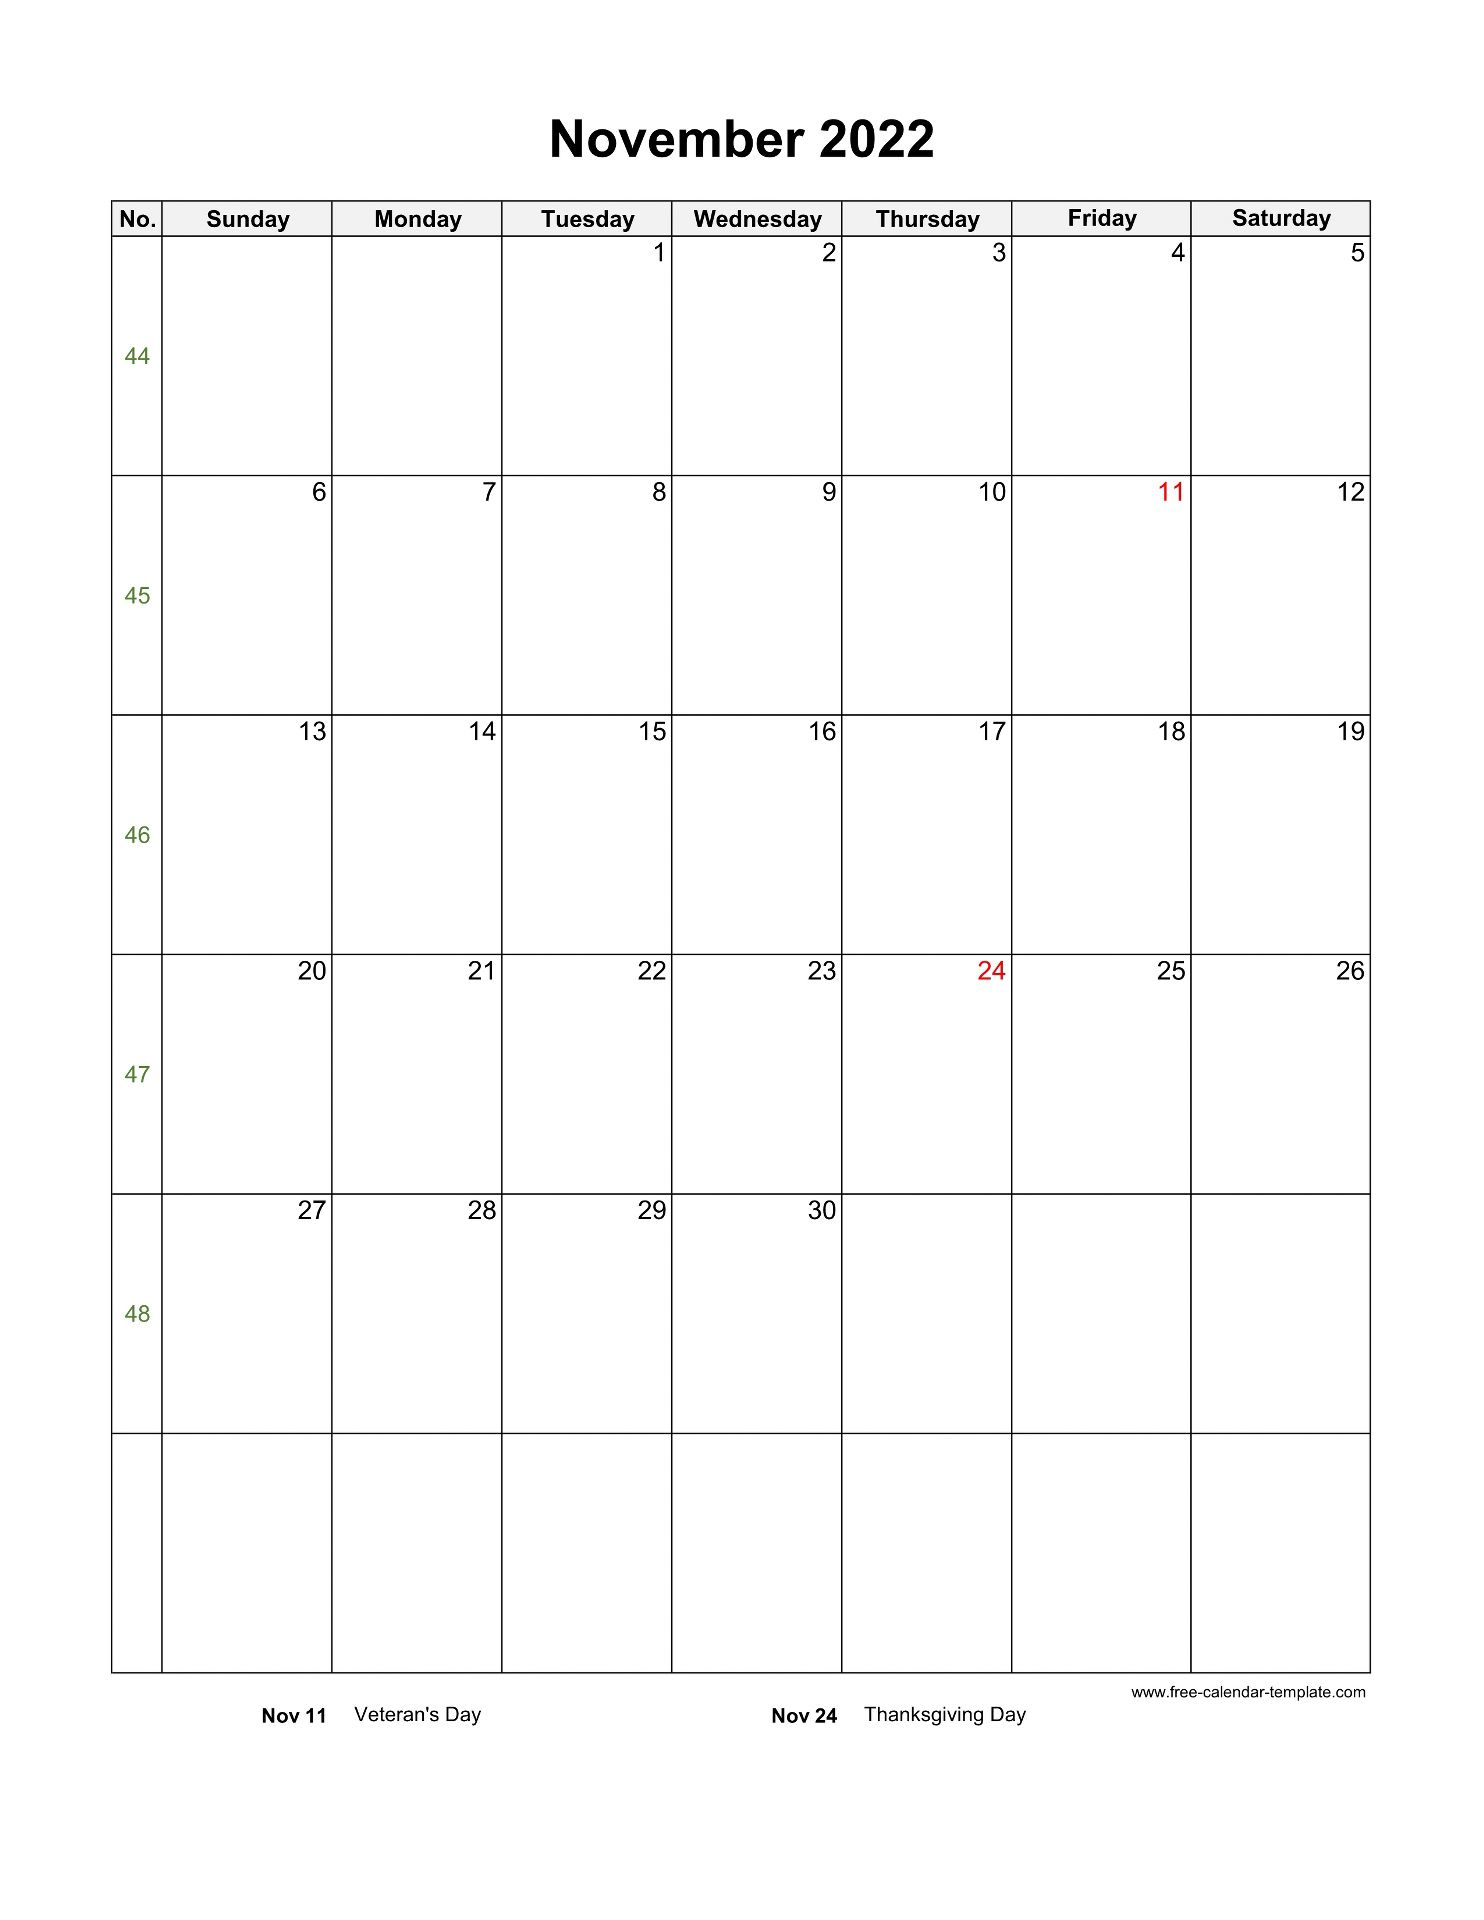 November 2022 Free Calendar Tempplate   Free-calendar ...